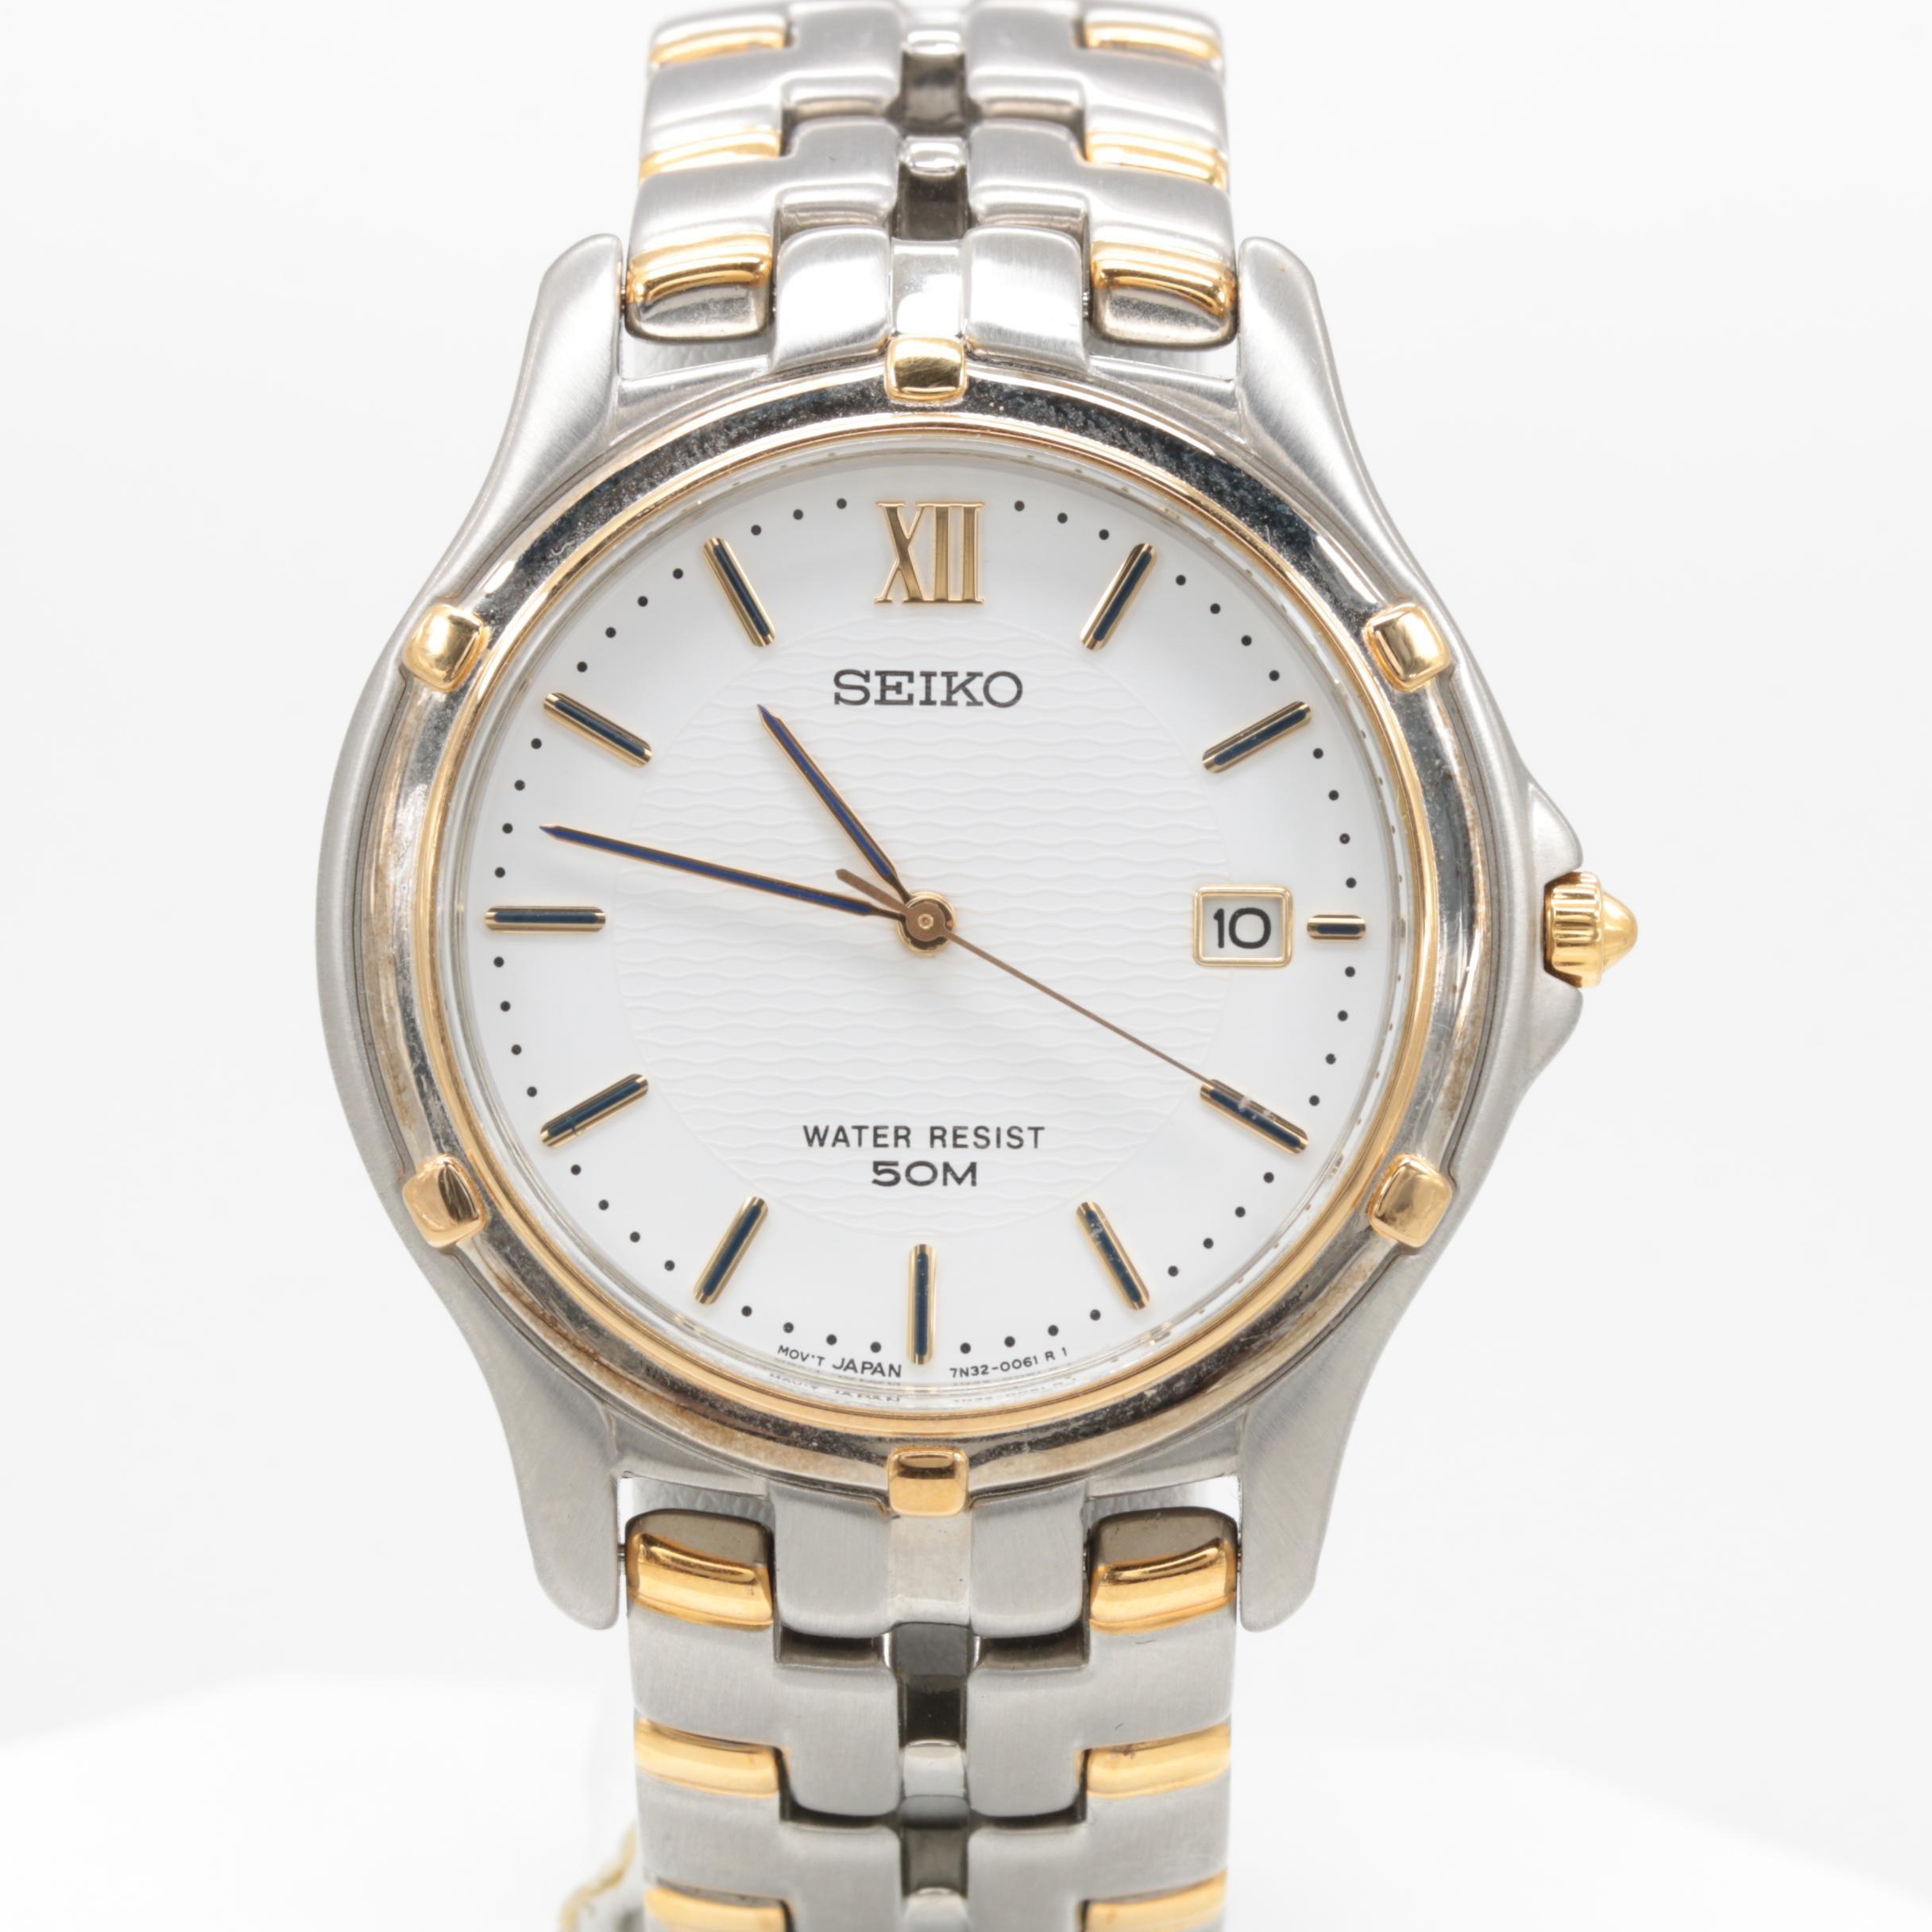 Seiko Two Tone Stainless Steel 50M Wristwatch